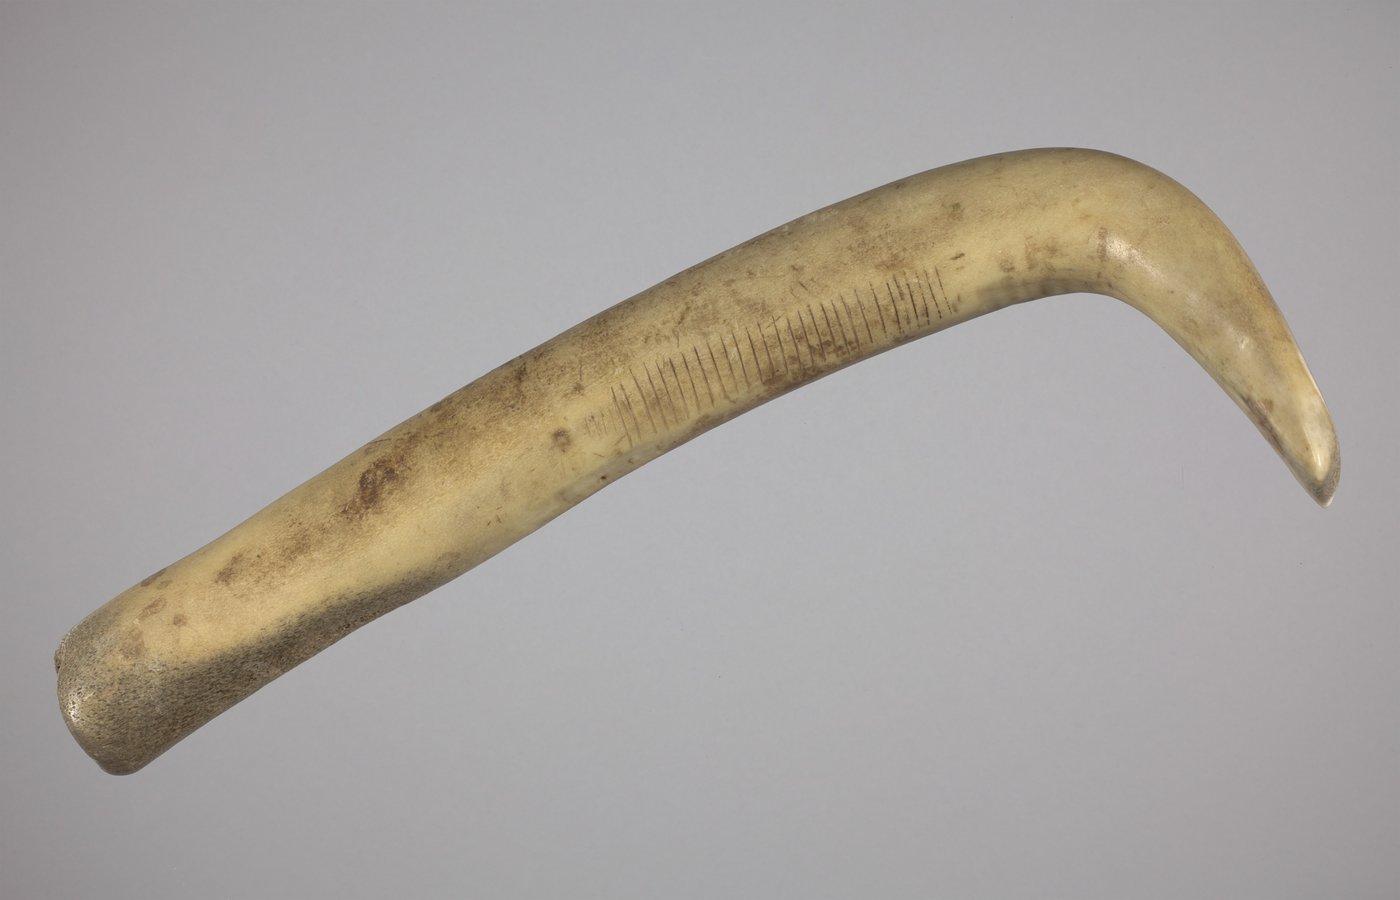 Elk Antler Scraper Handle from the Thompson Site, 14RC9 - 3